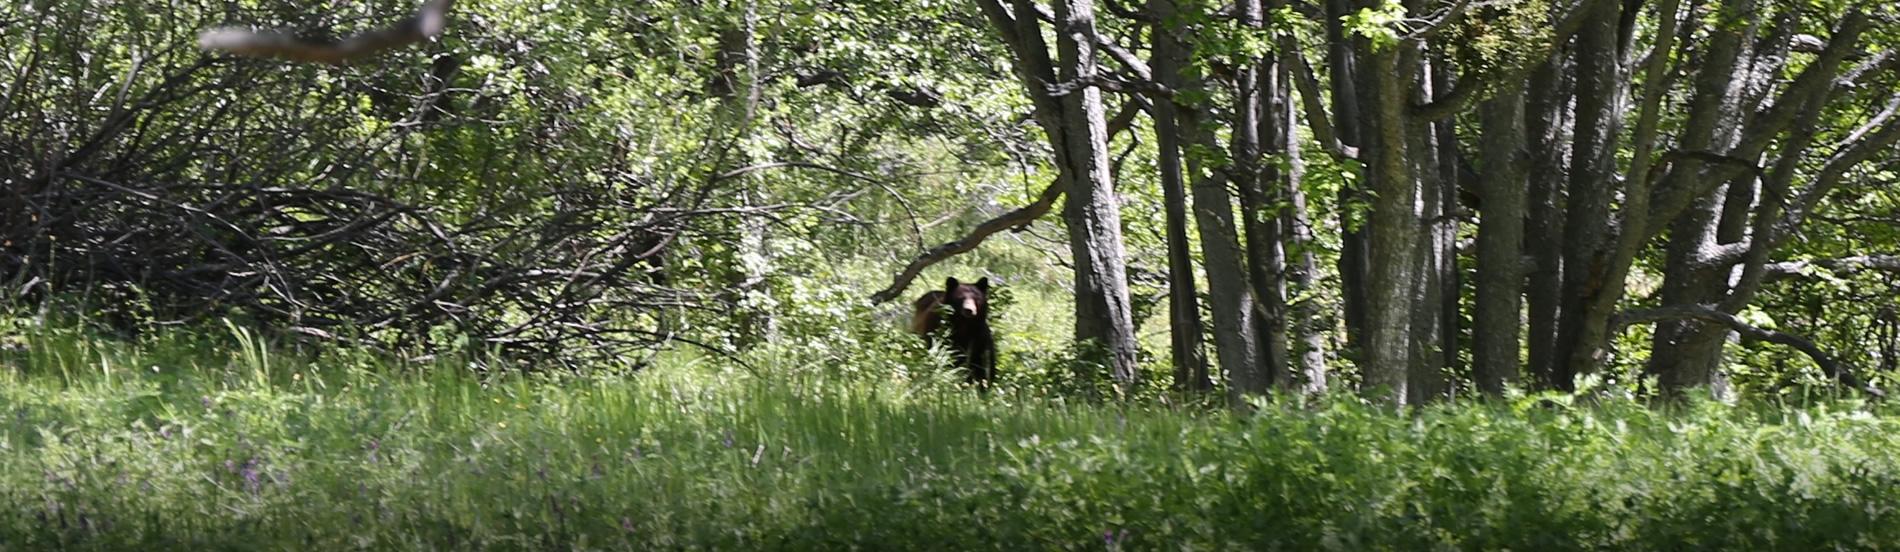 Black Bear on Grizzly Peak Preserve